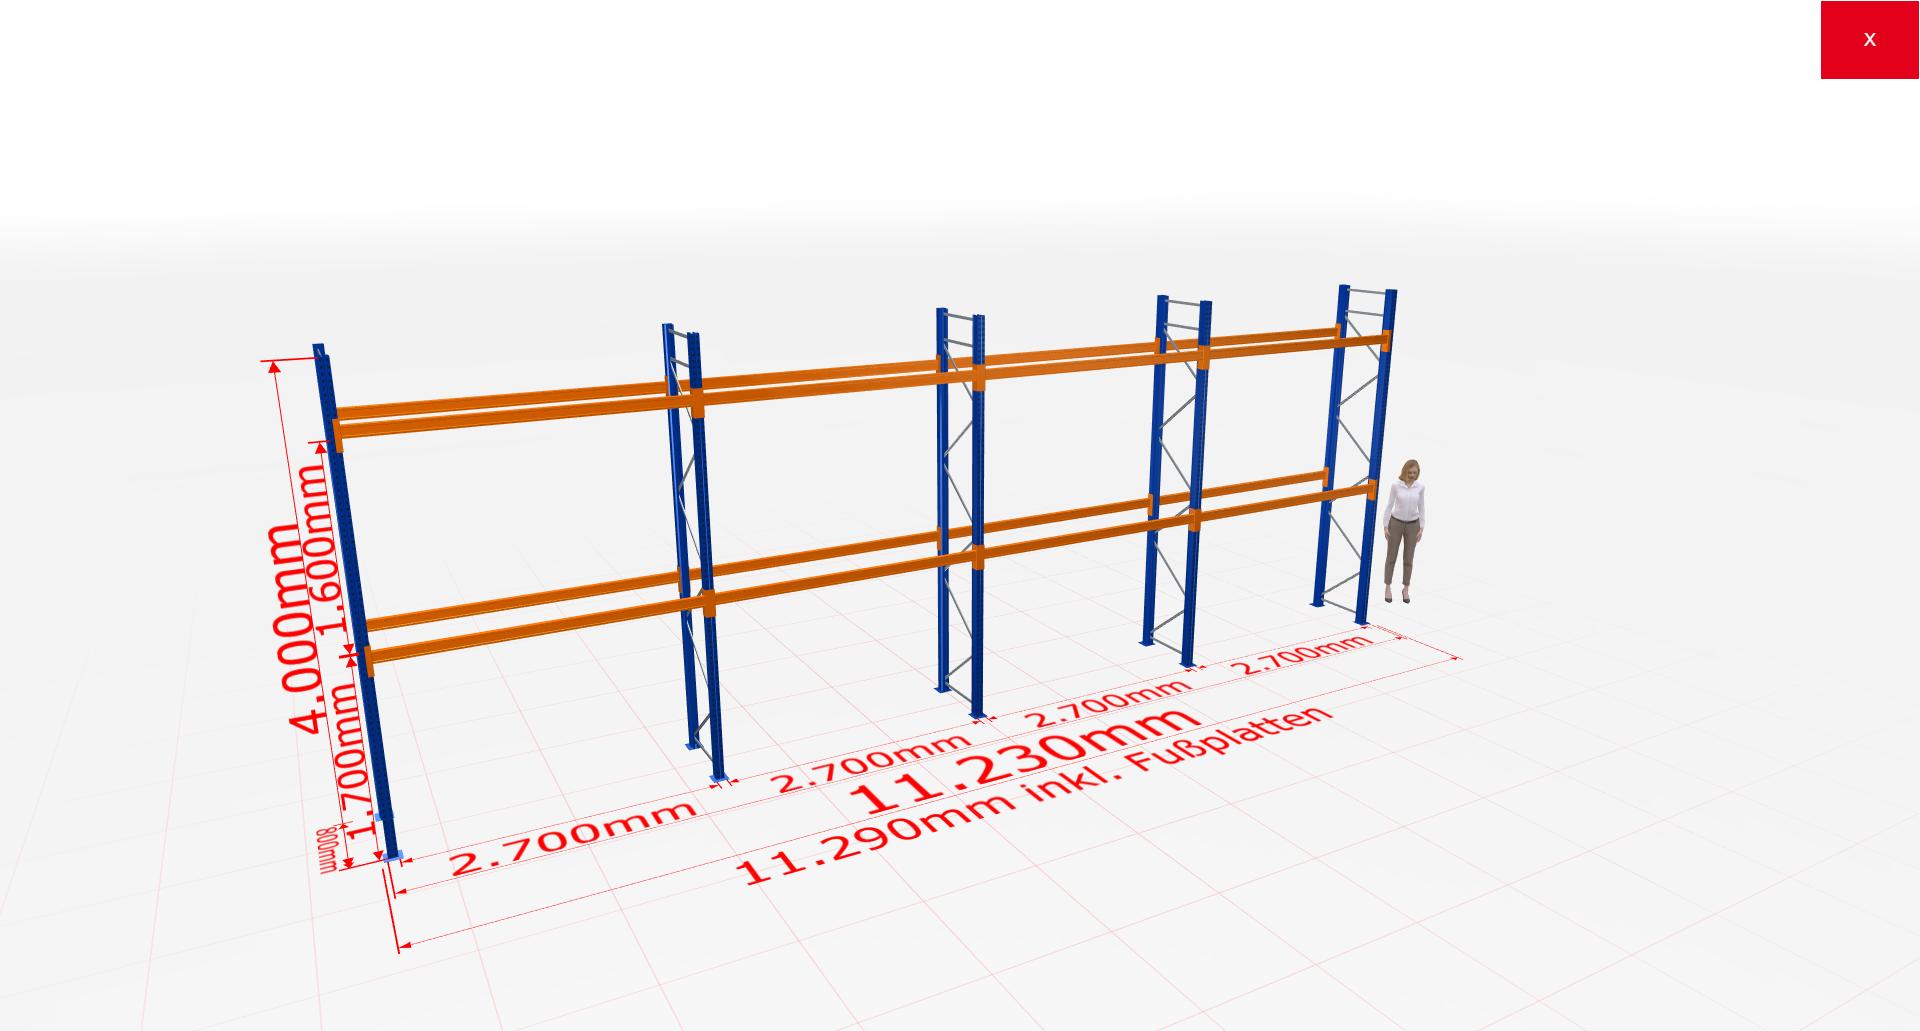 Palettenregal Komplettregal 4000x11230x800 mm (HxBxT) 2 Fachebenen SCHULTE Lagertechnik